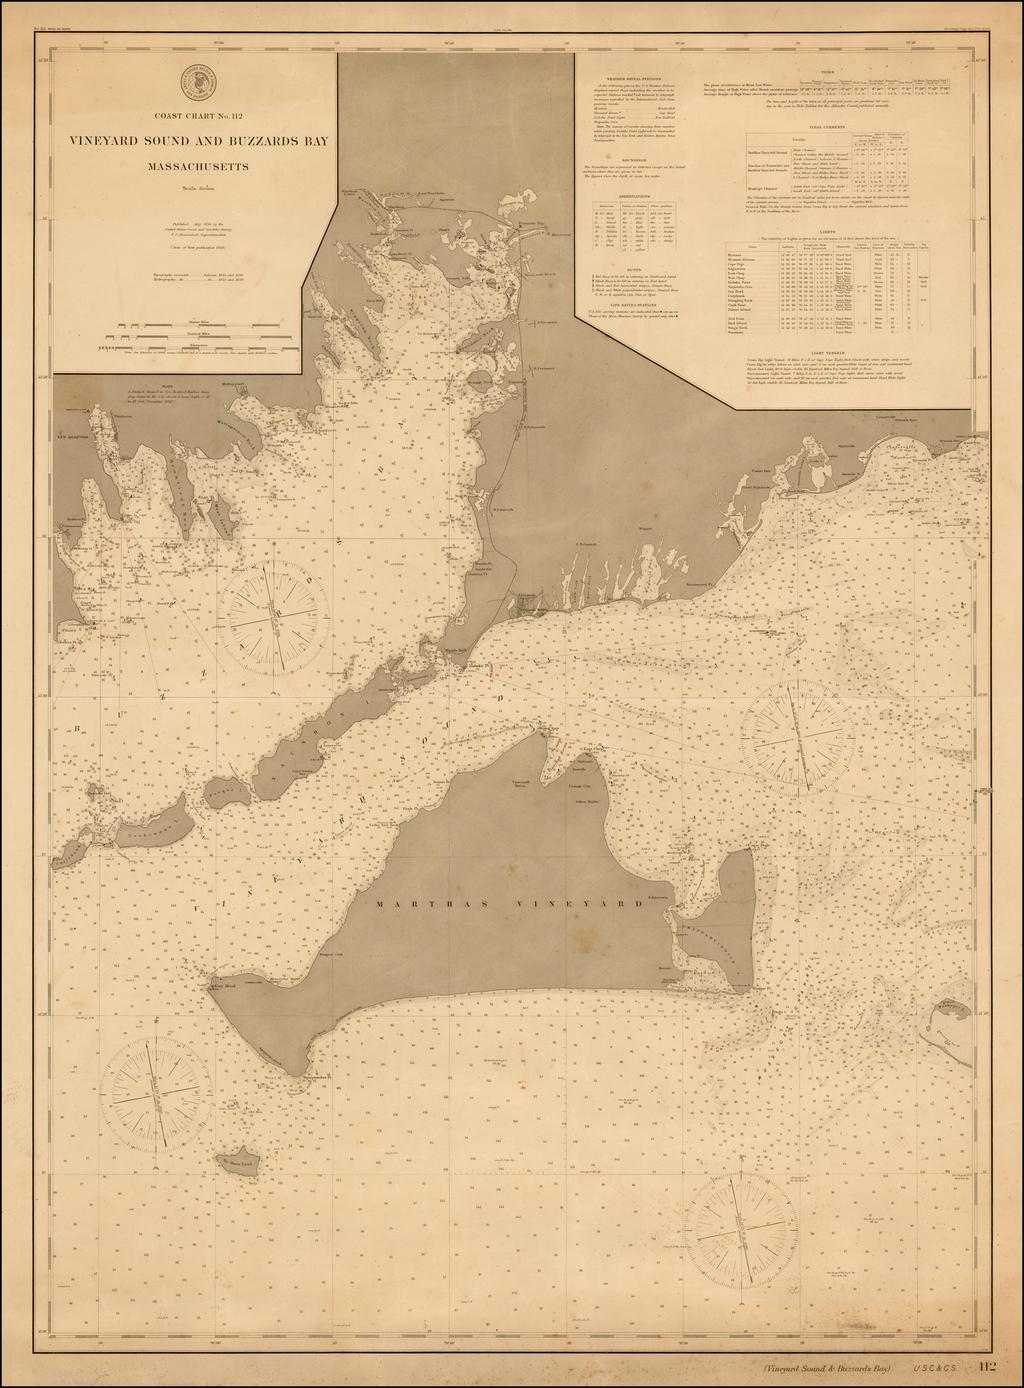 Vineyard Sound and Buzzards Bay Massachusetts By U.S. Coast & Geodetic Survey